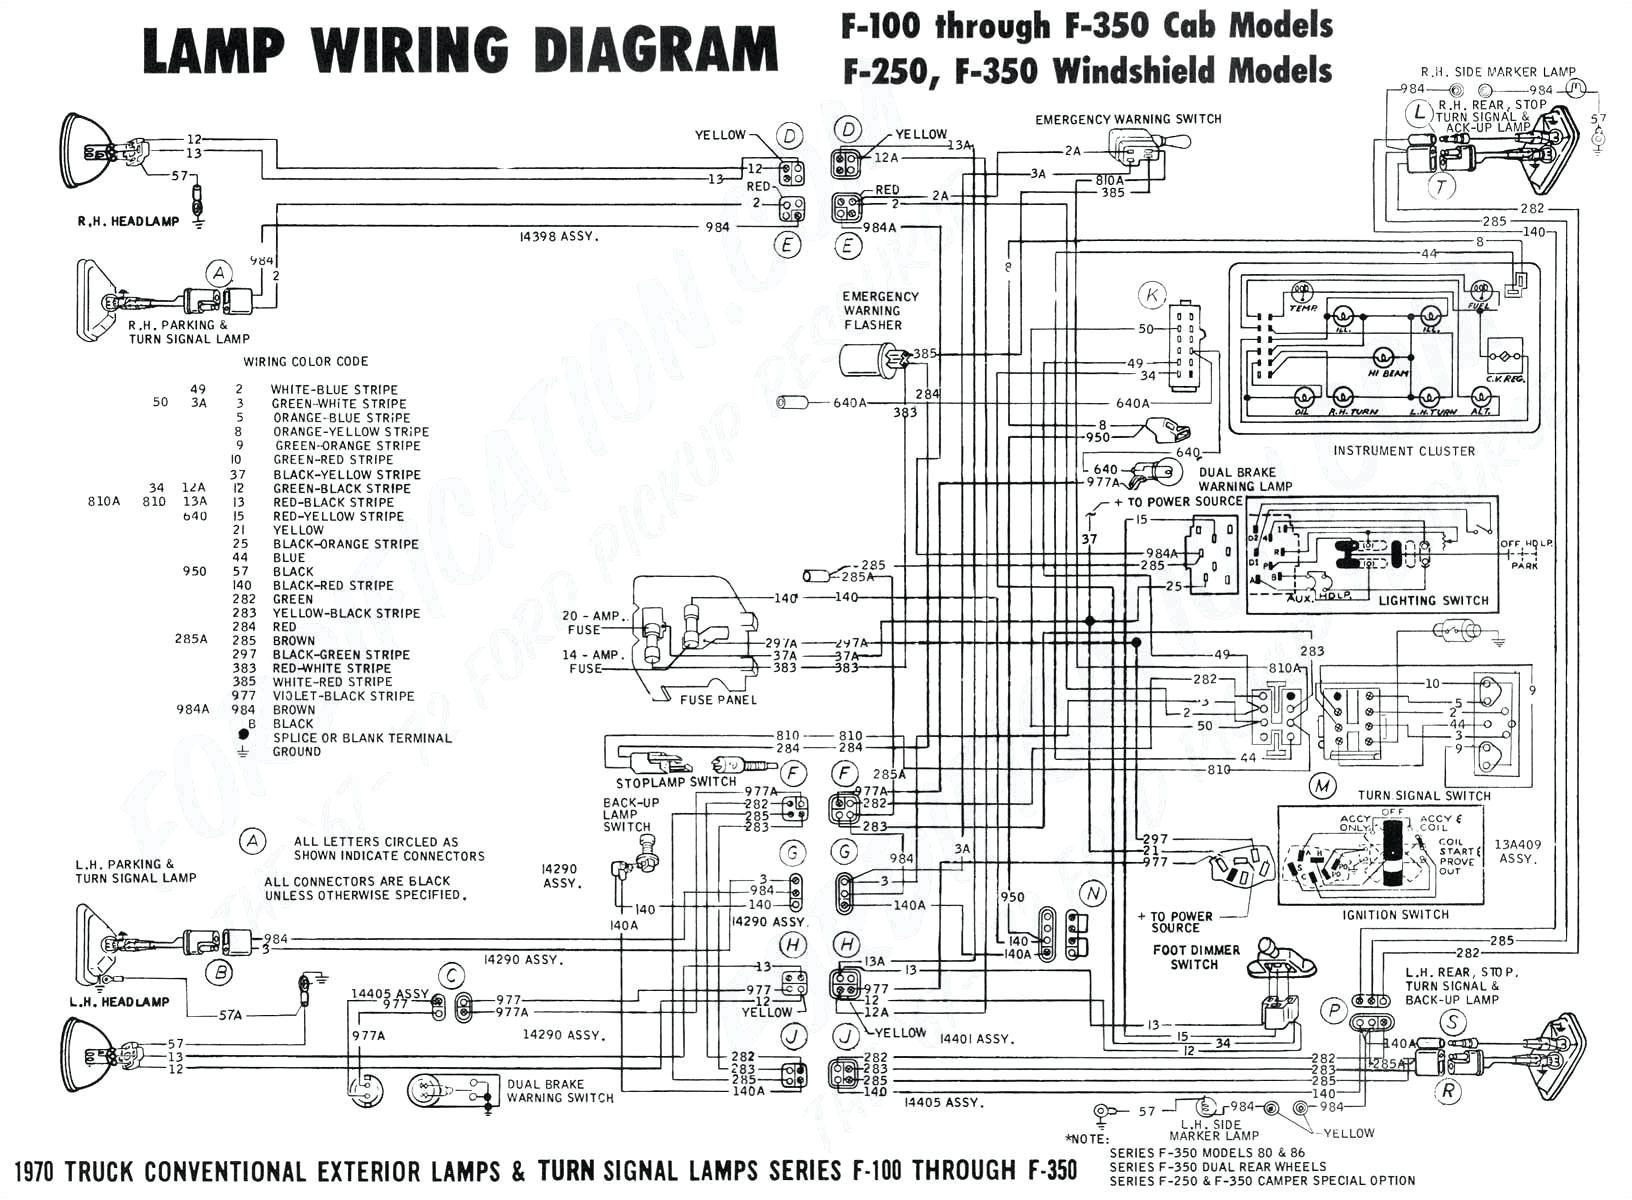 05 Ford Escape Radio Wiring Diagram